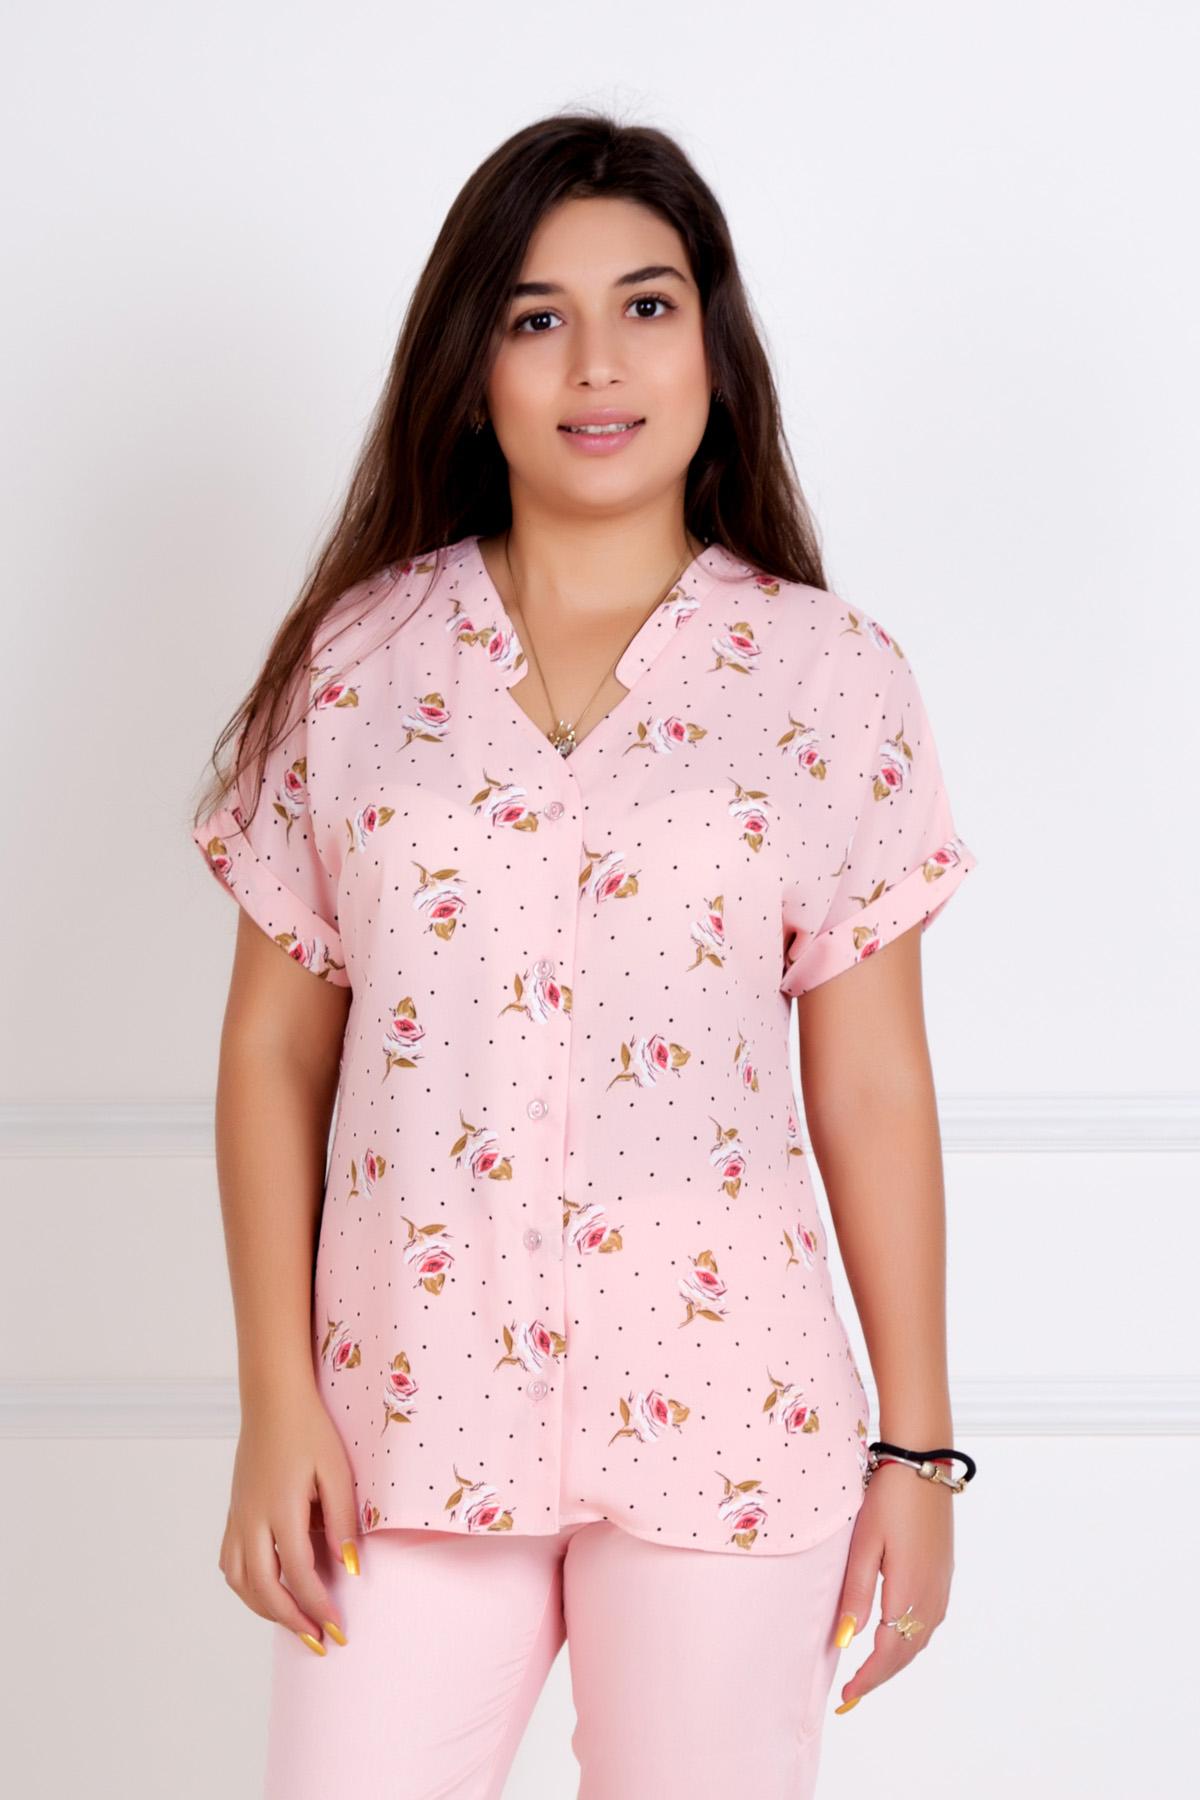 Жен. блуза Илона Розовый р. 44Блузы<br>Обхват груди: 88 см <br>Обхват талии: 68 см <br>Обхват бедер: 96 см <br>Длина по спинке: 63 см <br>Рост: 167 см<br><br>Тип: Жен. блуза<br>Размер: 44<br>Материал: Шифон